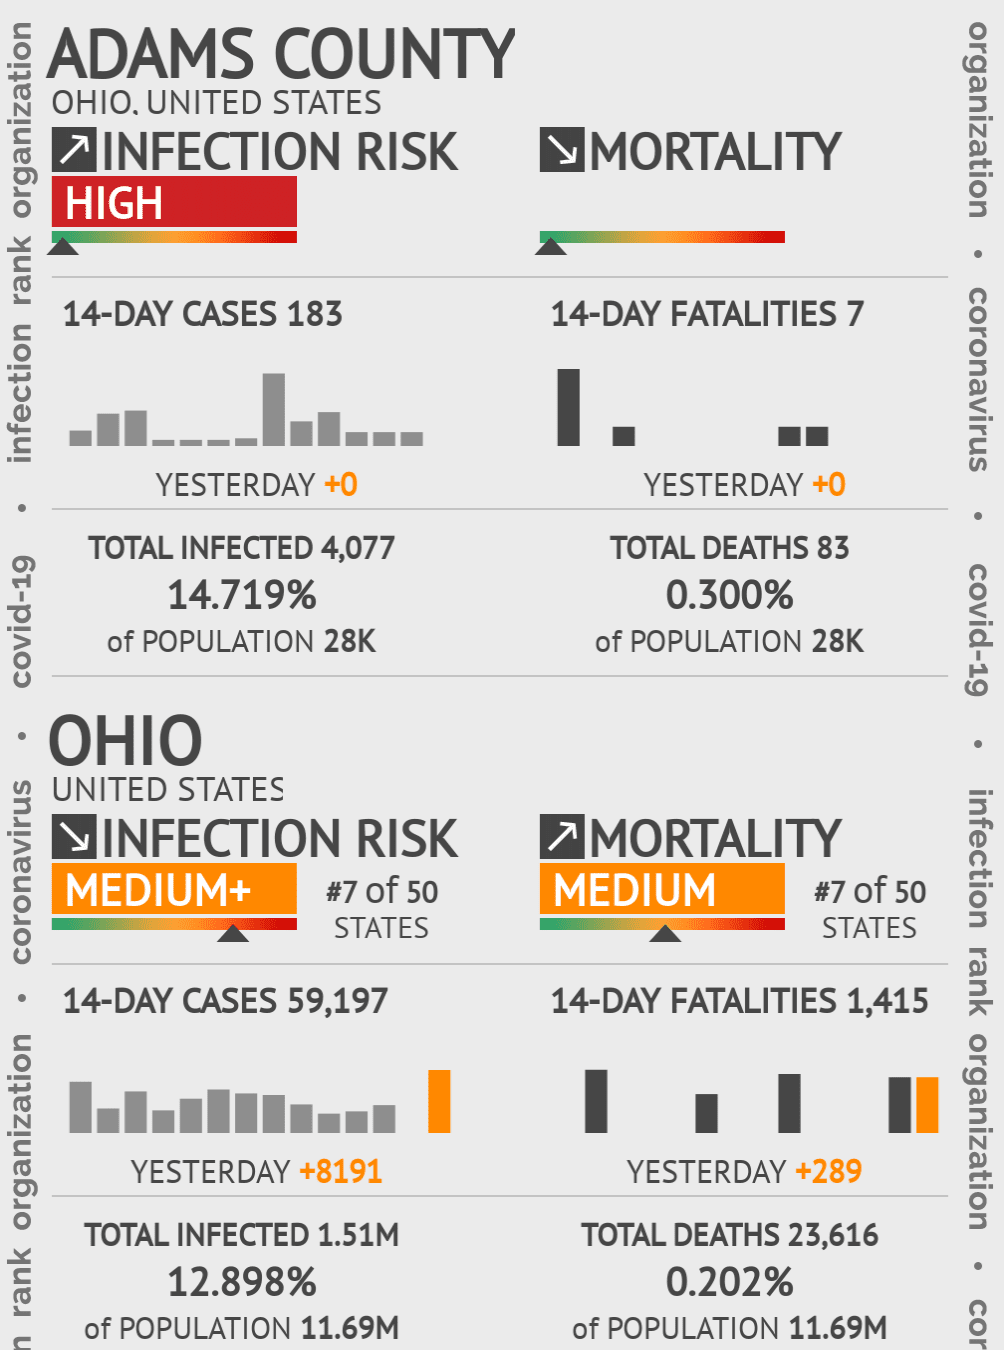 Adams County Coronavirus Covid-19 Risk of Infection on February 23, 2021